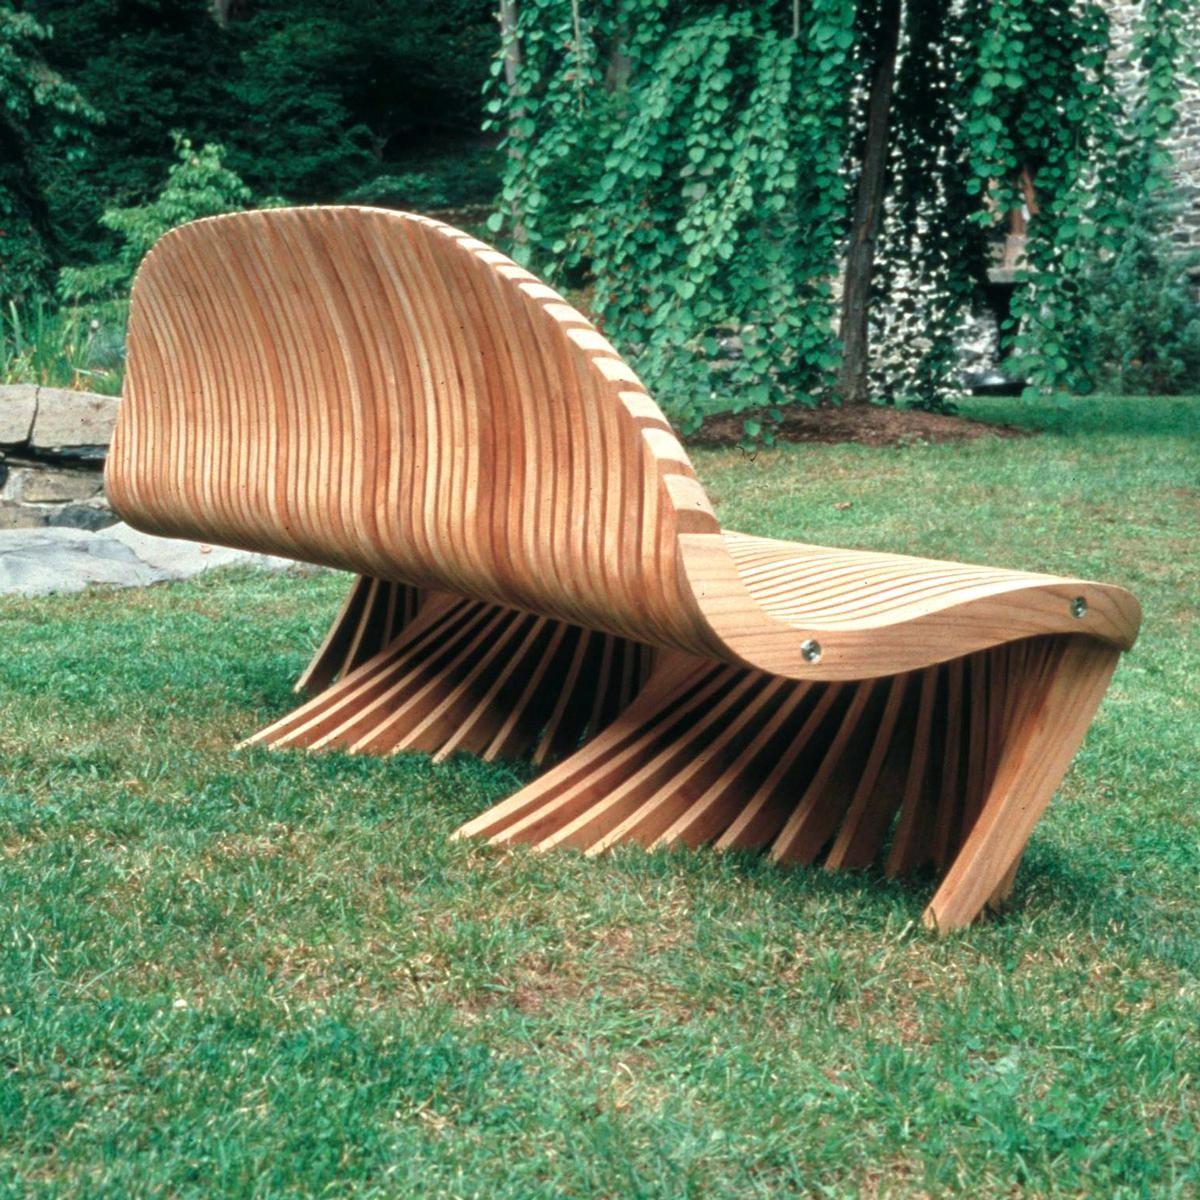 Broyhill Teak Bench Teak Garden Bench Teak Bench Build Outdoor Furniture